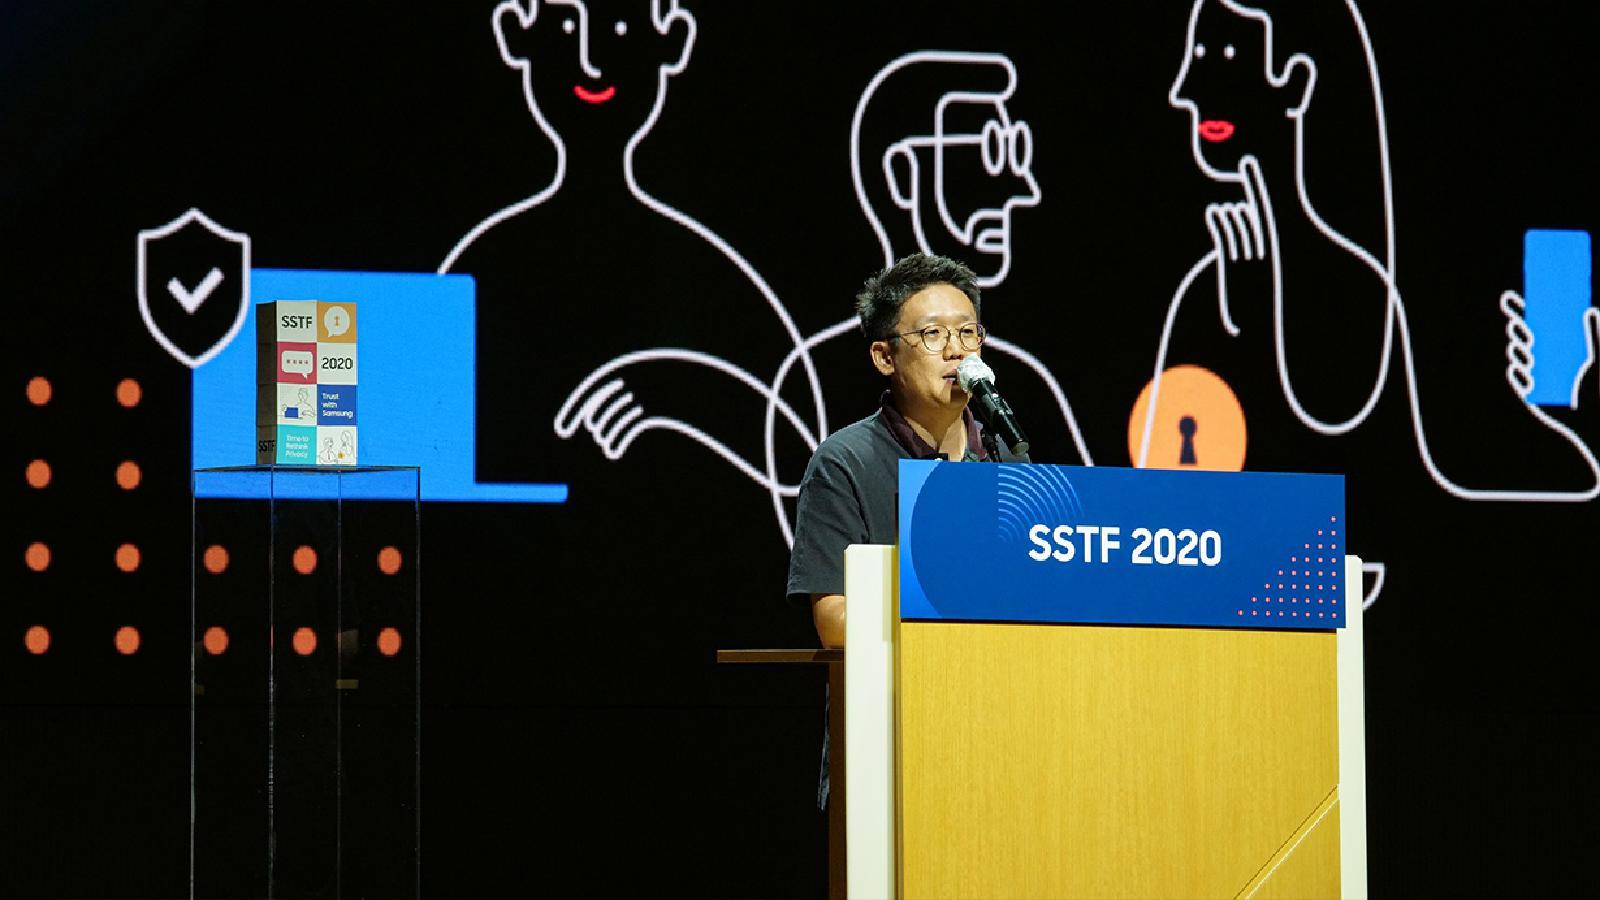 SSTF 2020 8